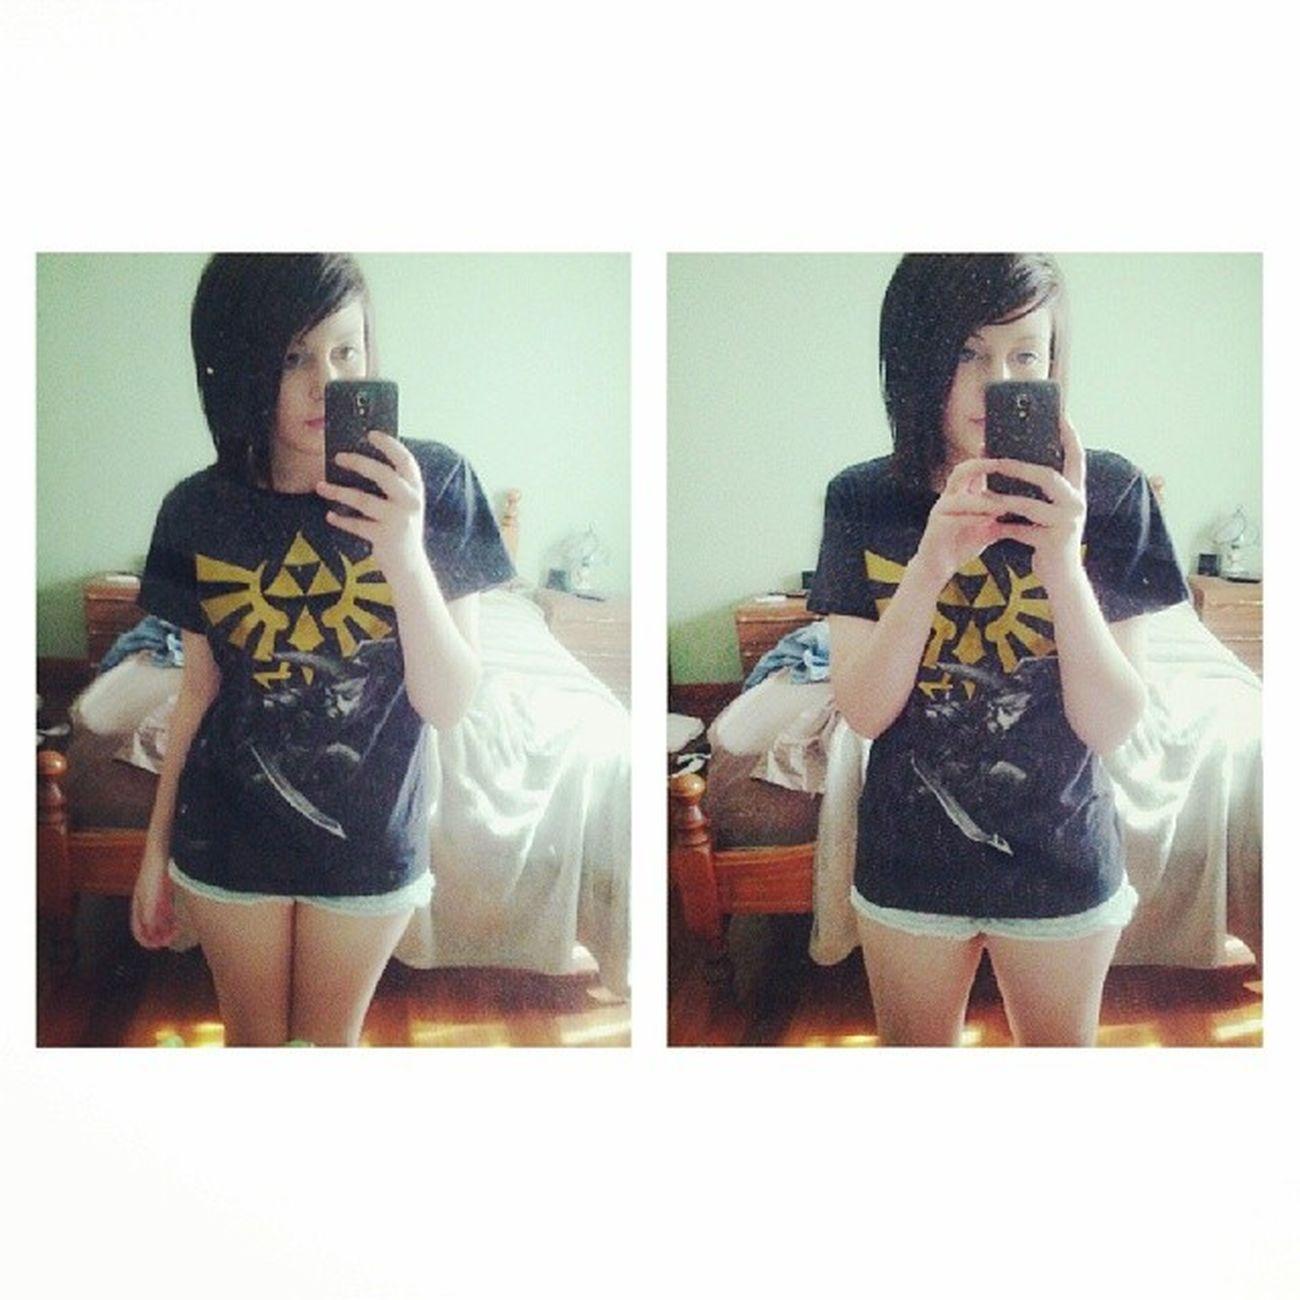 I have too many Legend of Zelda shirts.. Loz Zelda LegendOfZelda  Triforce favourite link power wisdom courage selfie